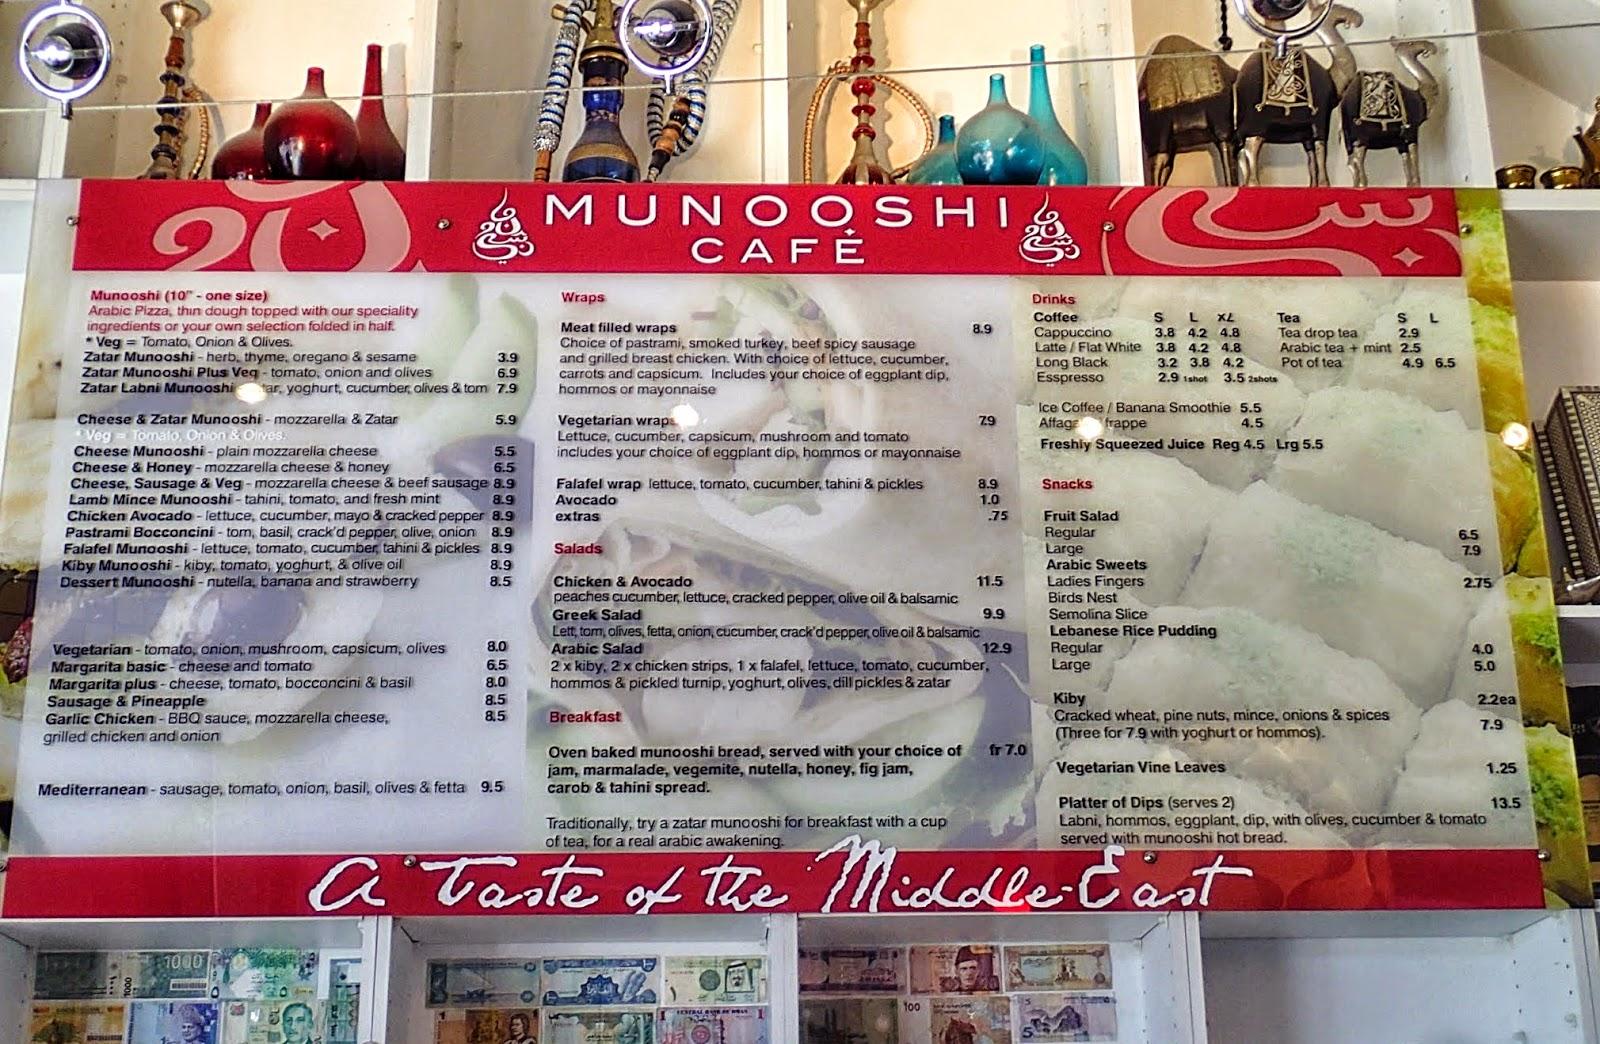 munooshi cafe review 2014